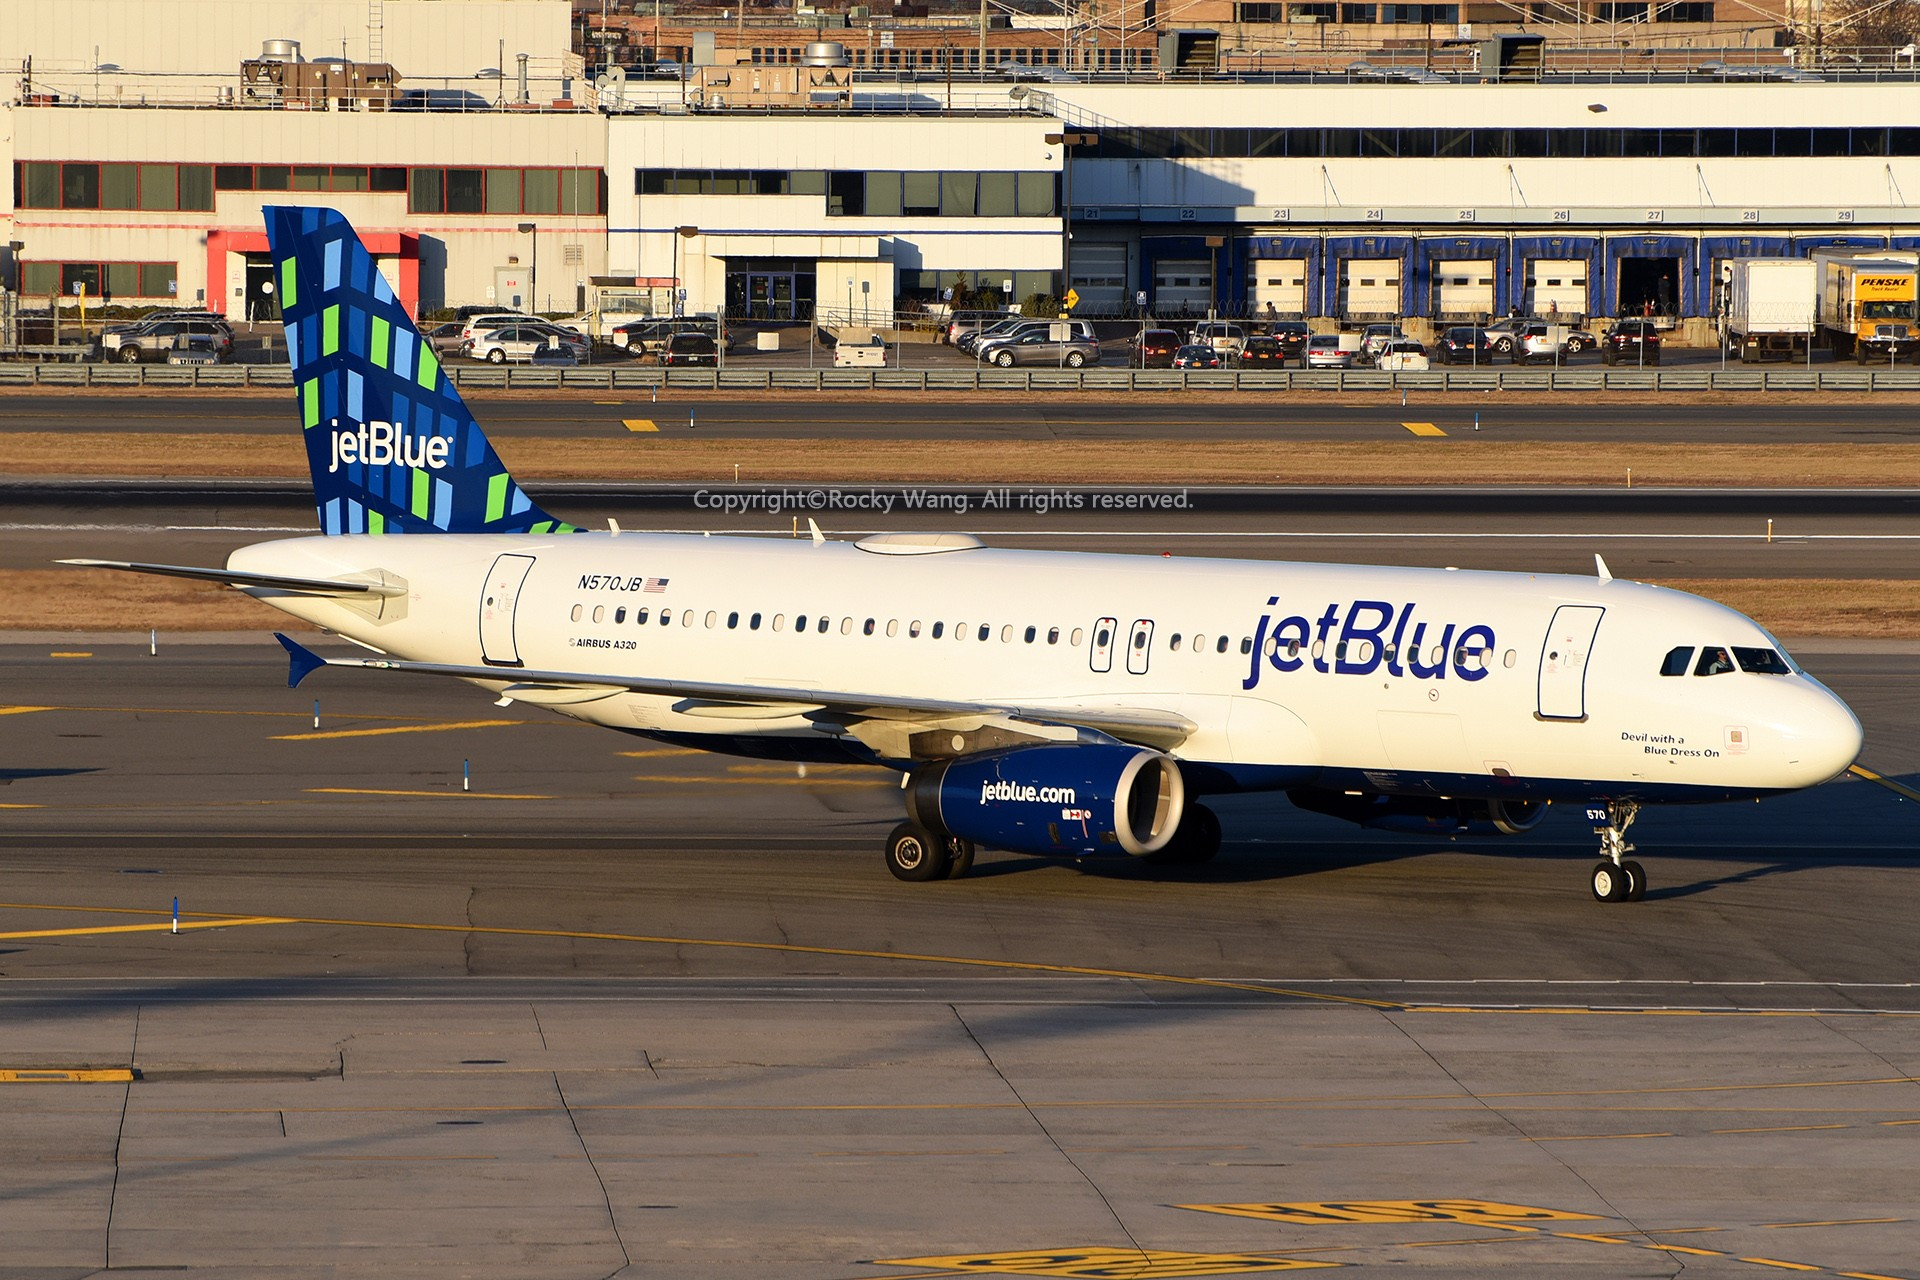 Re:[原创]窄体连连看 AIRBUS A320-232 N570JB 美国纽约约翰·菲茨杰拉德·肯尼迪国际机场